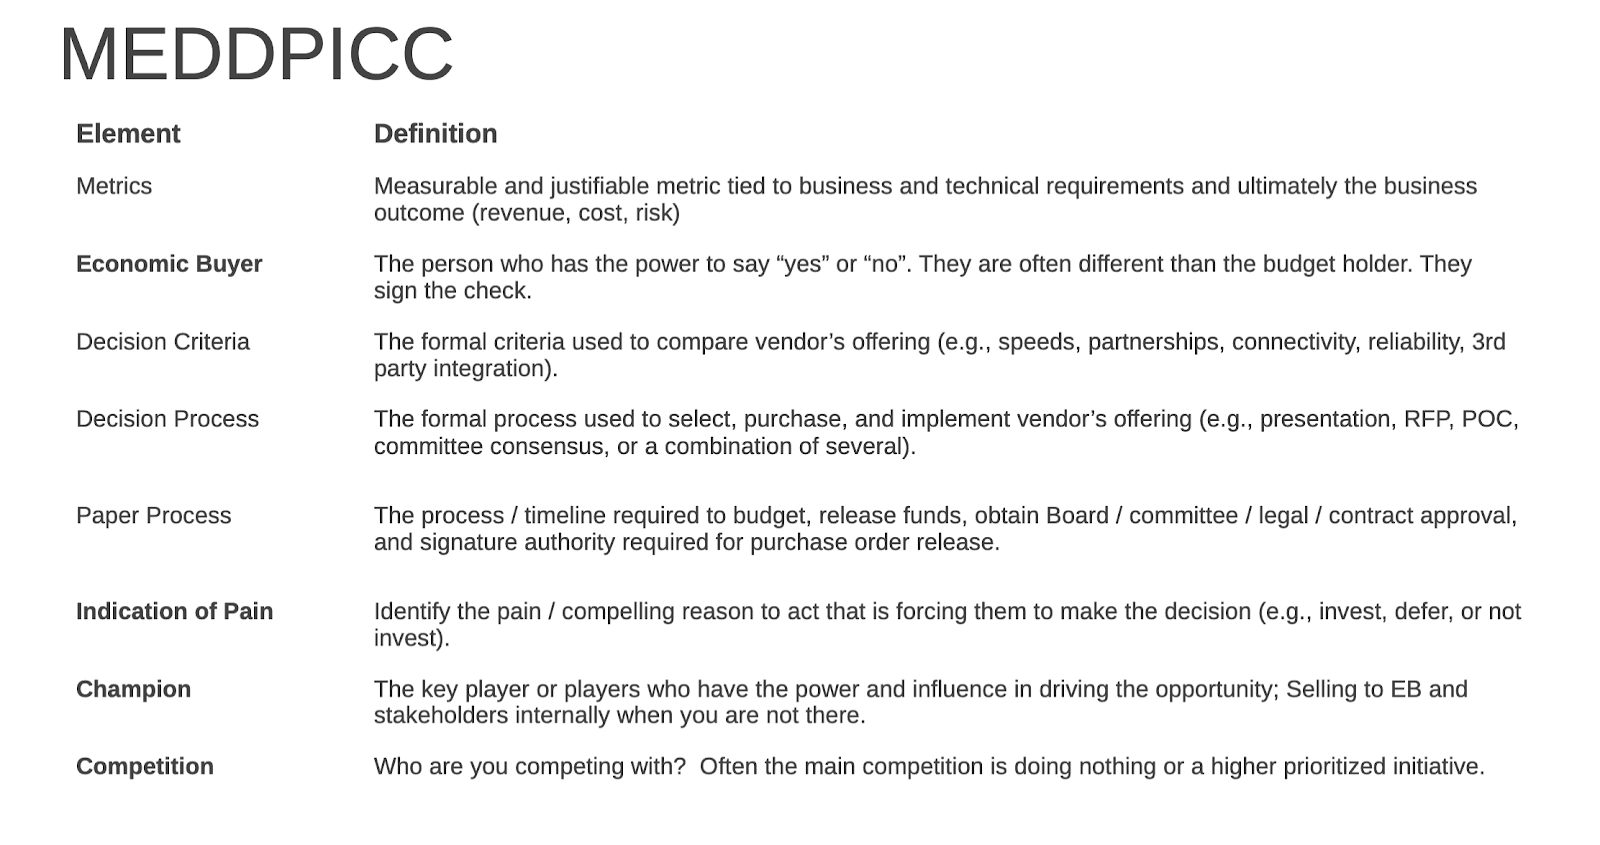 MEDDPICC: Metrics, economic buyer, decision criteria, decision process, paper process, indication of pain, champion, competition.